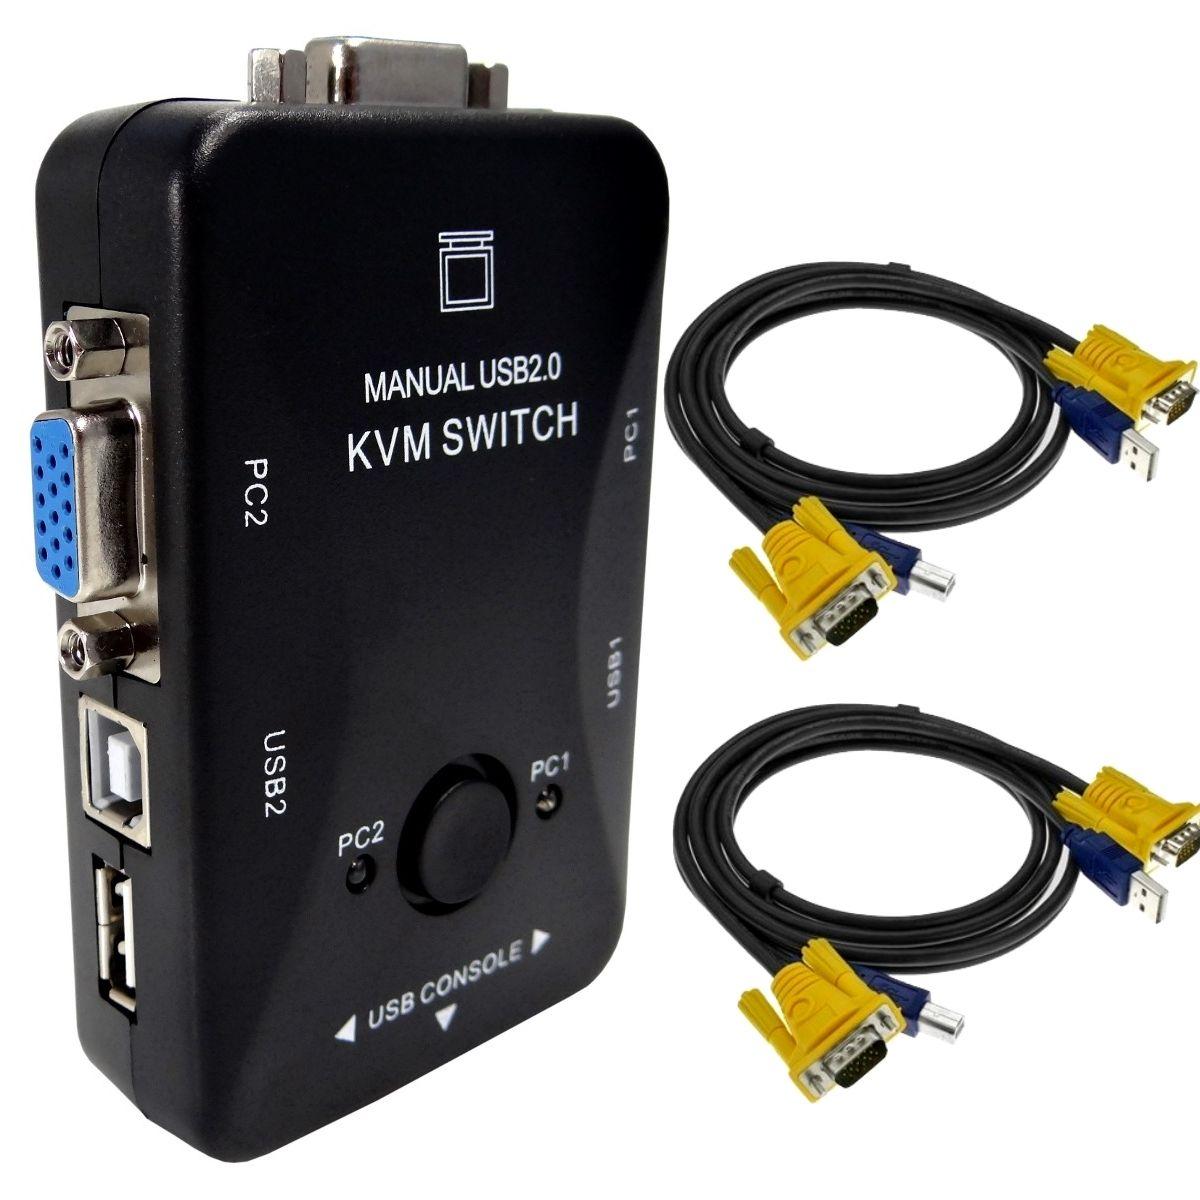 KIT CHAVEADOR KVM (VGA+USB) + 2 CABOS